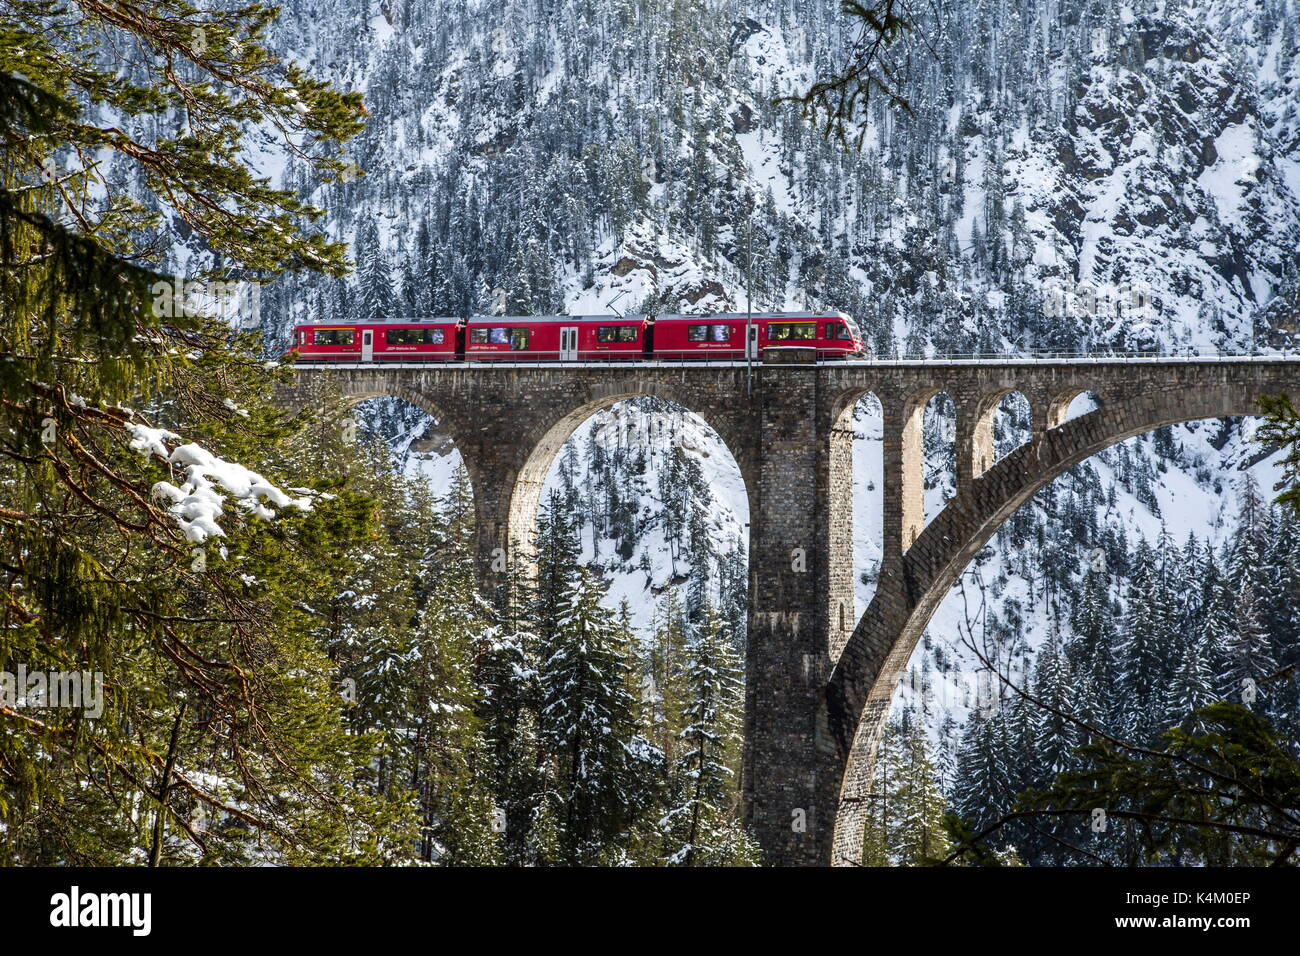 Bernina Express Zug auf Wiesener Viadukt, Davos, Schweiz Stockbild